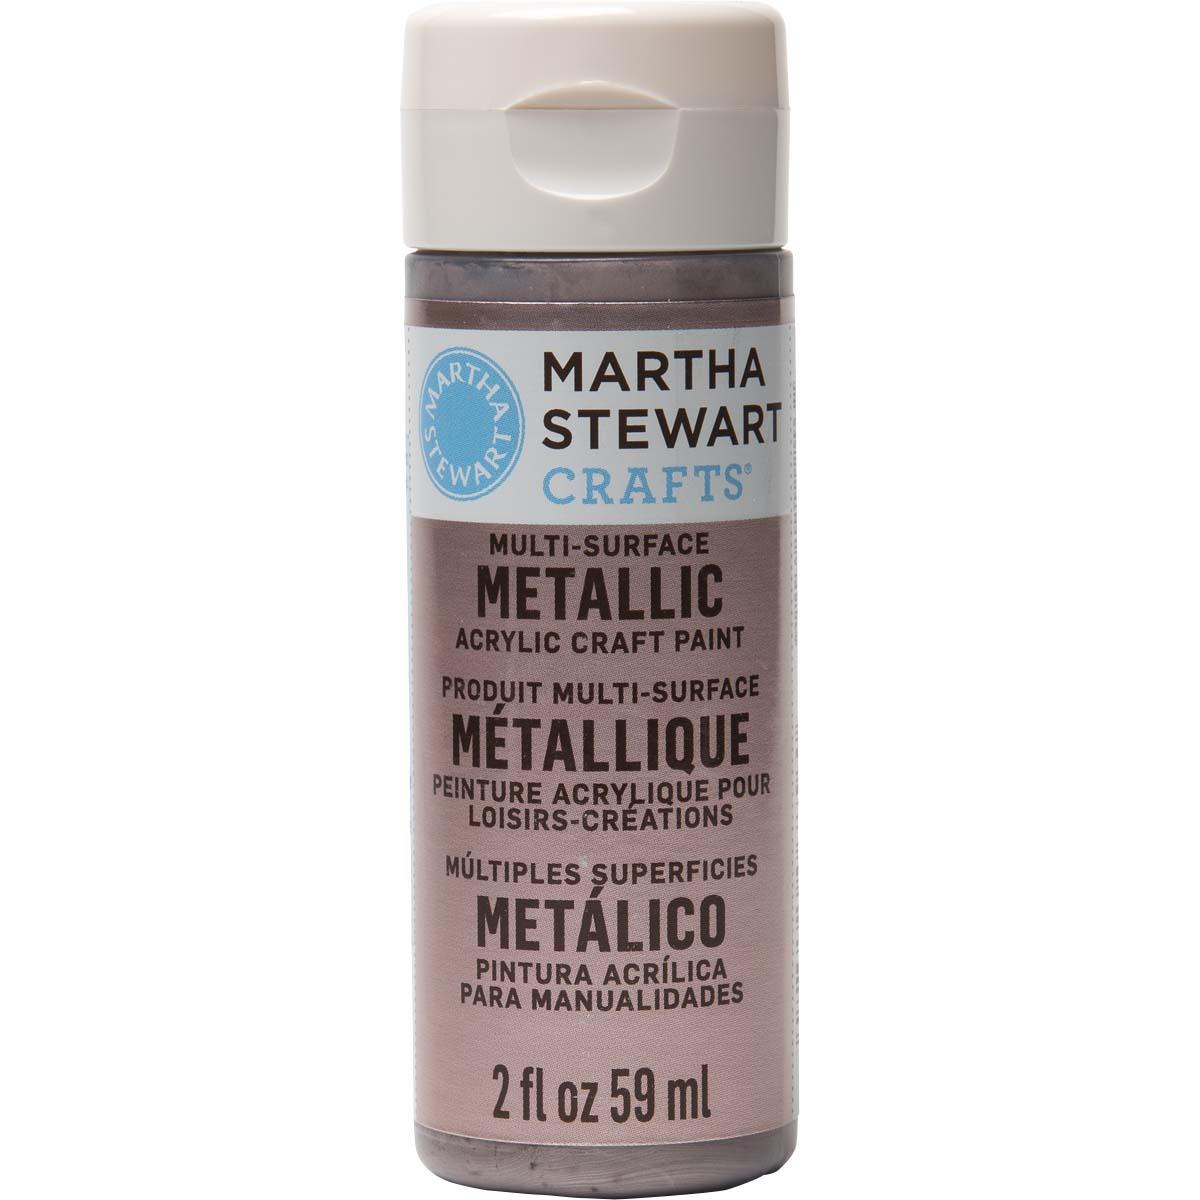 Martha Stewart ® Multi-Surface Metallic Acrylic Craft Paint - Rose Chrome, 2 oz. - 32995CA